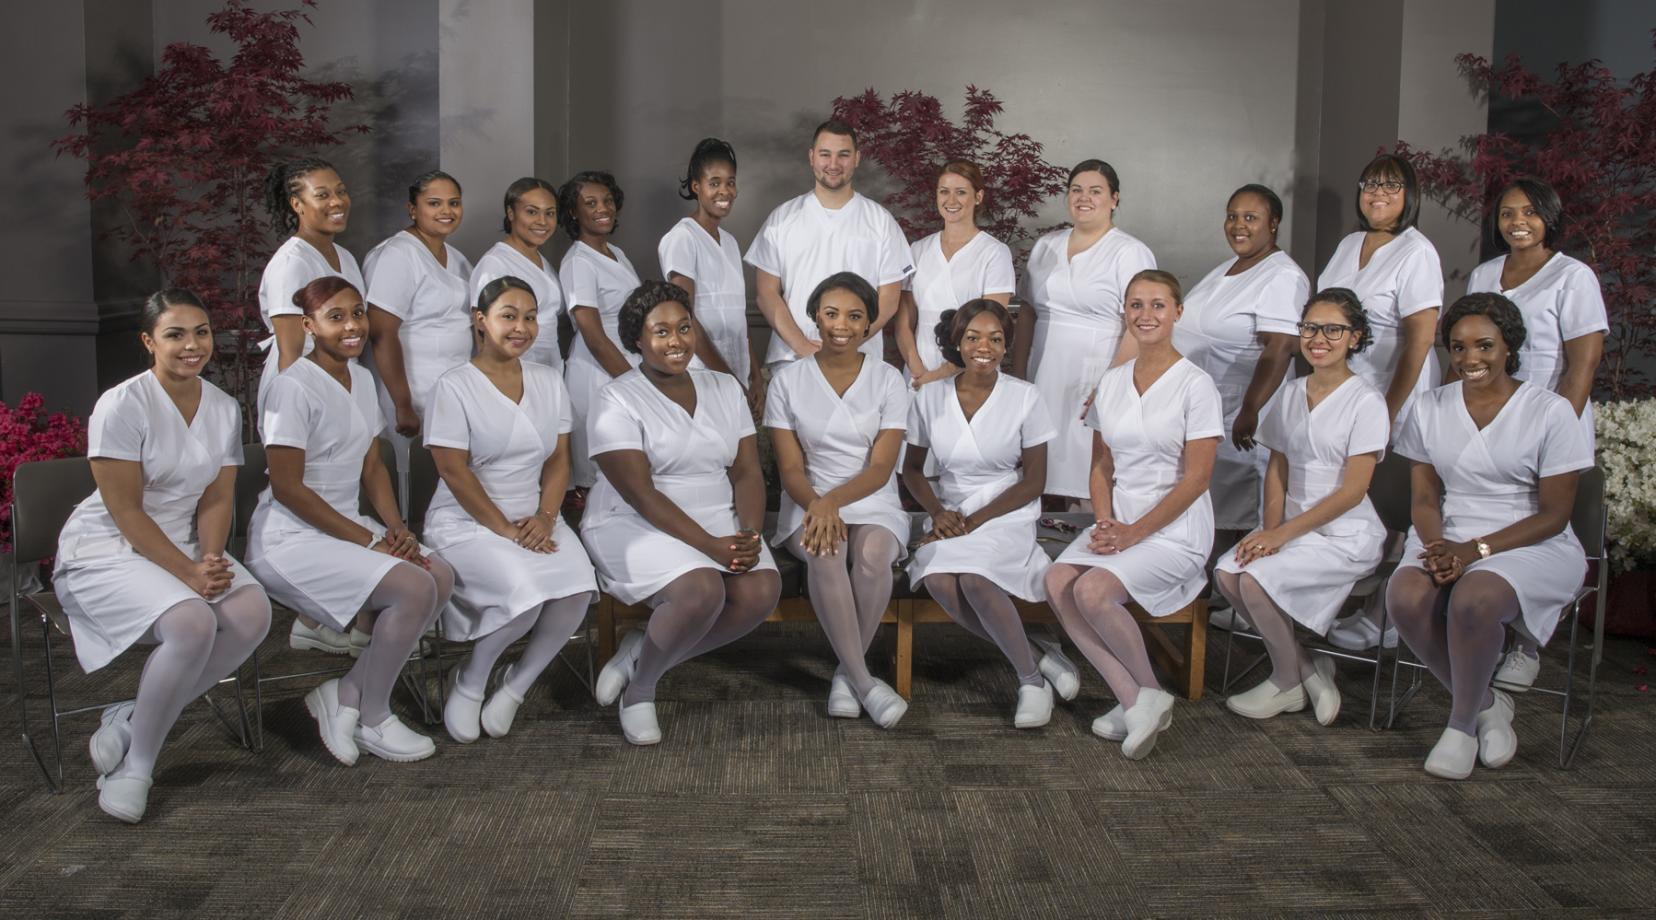 2017 Nursing Graduates